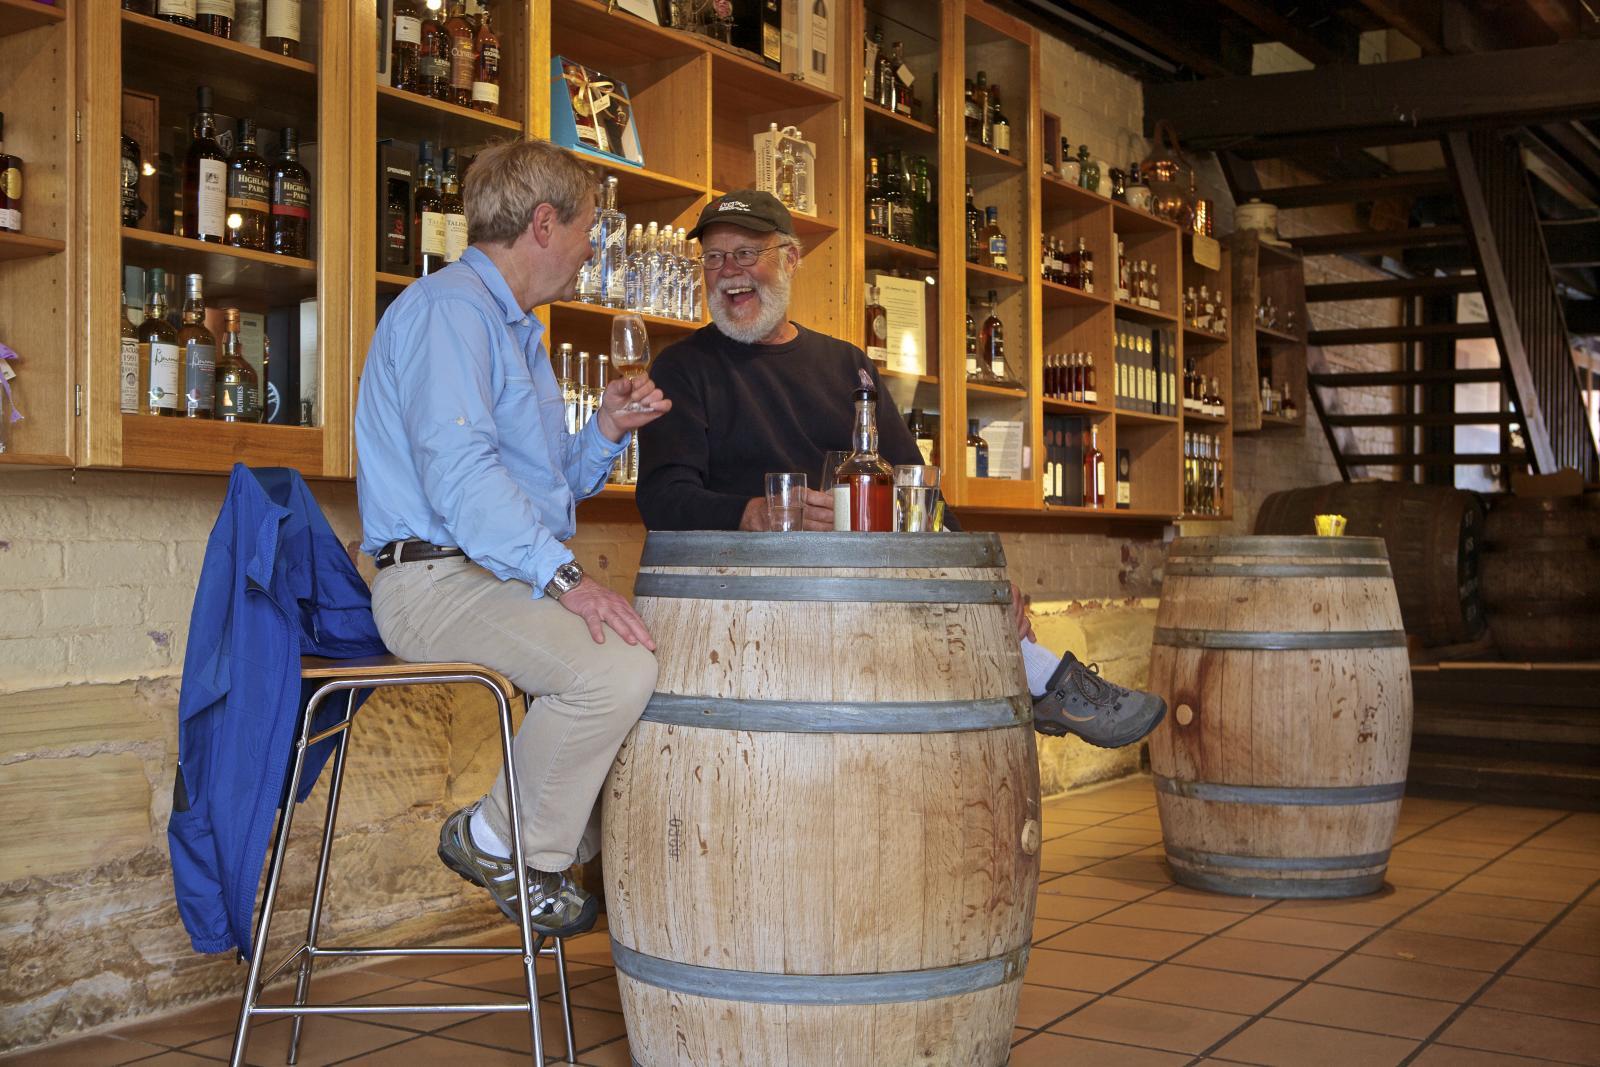 Whisky at Lark Distillery in Hobart Tasmania